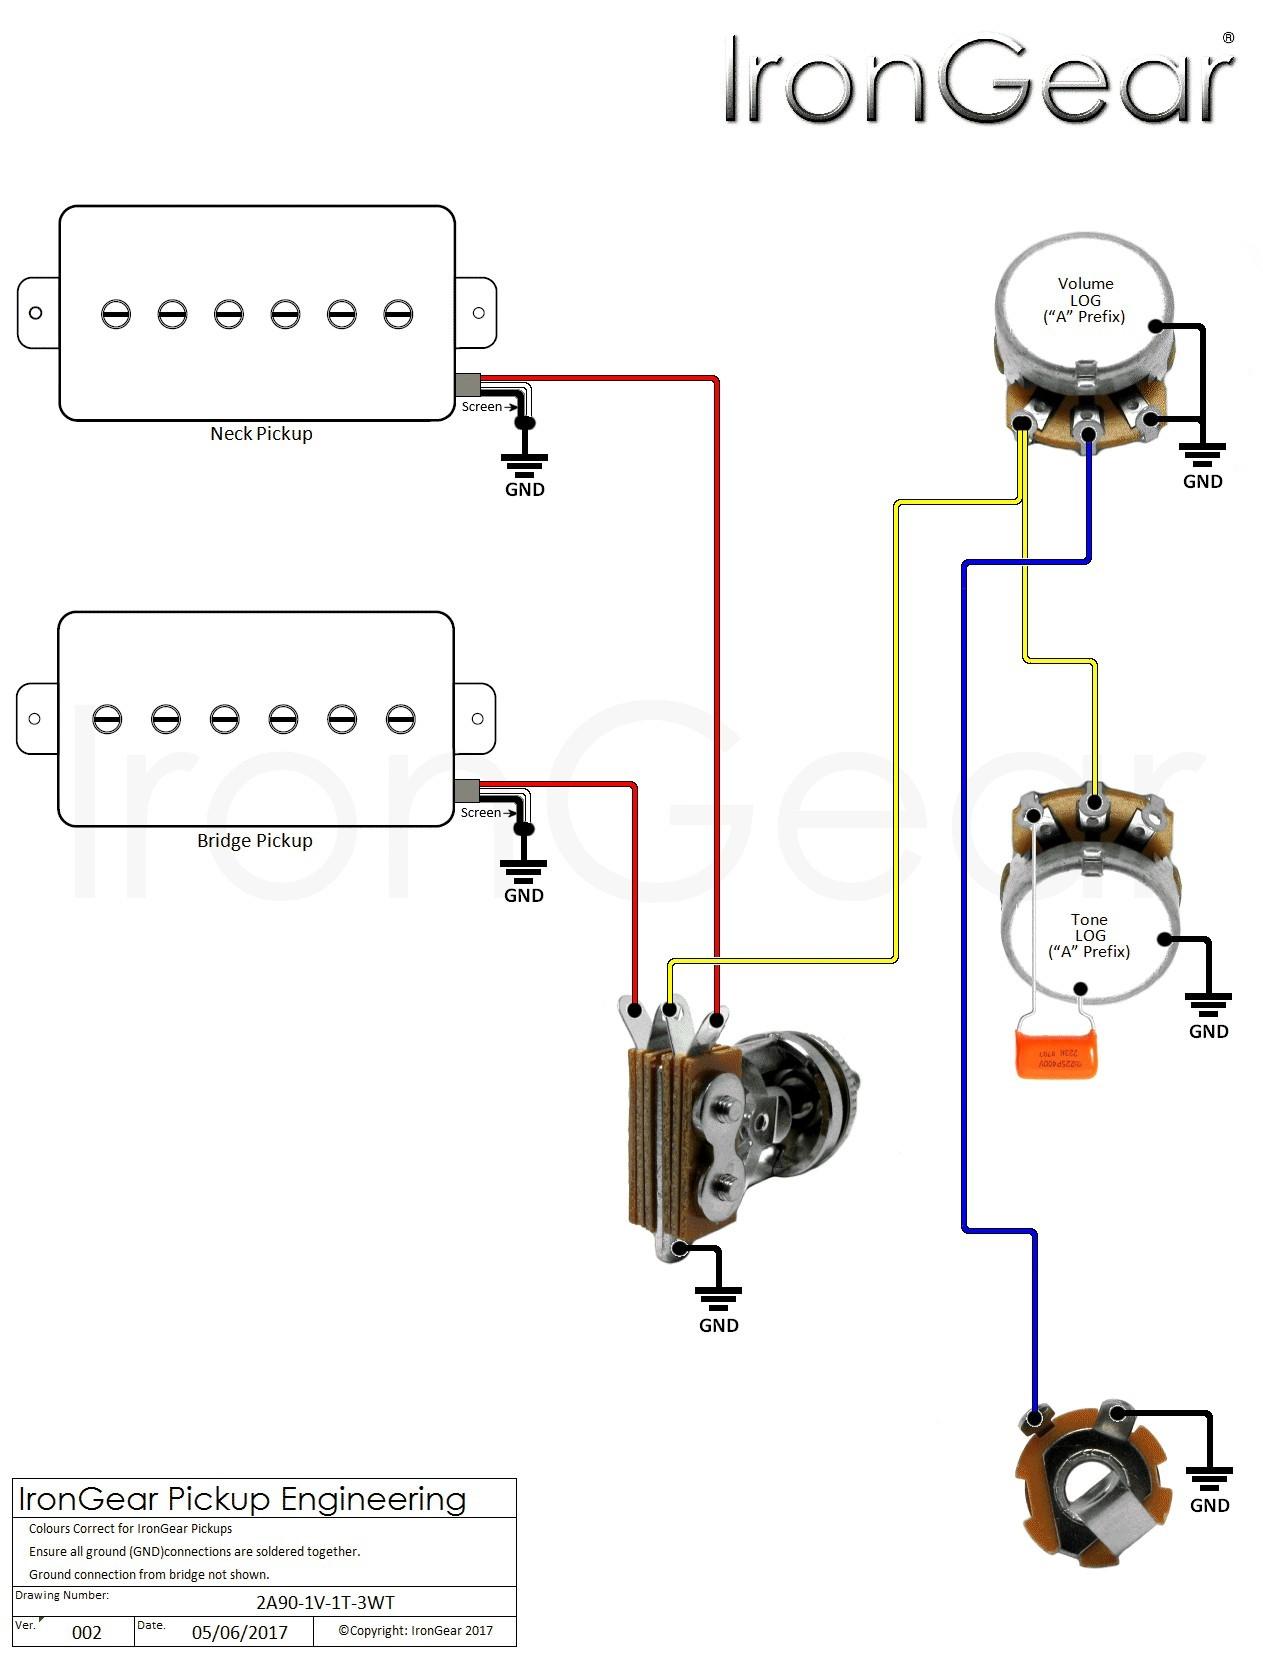 Active Guitar Wiring Diagram Fresh Guitar Wiring Diagram 2 Humbucker 1 Volume 1 tone Roc Grp